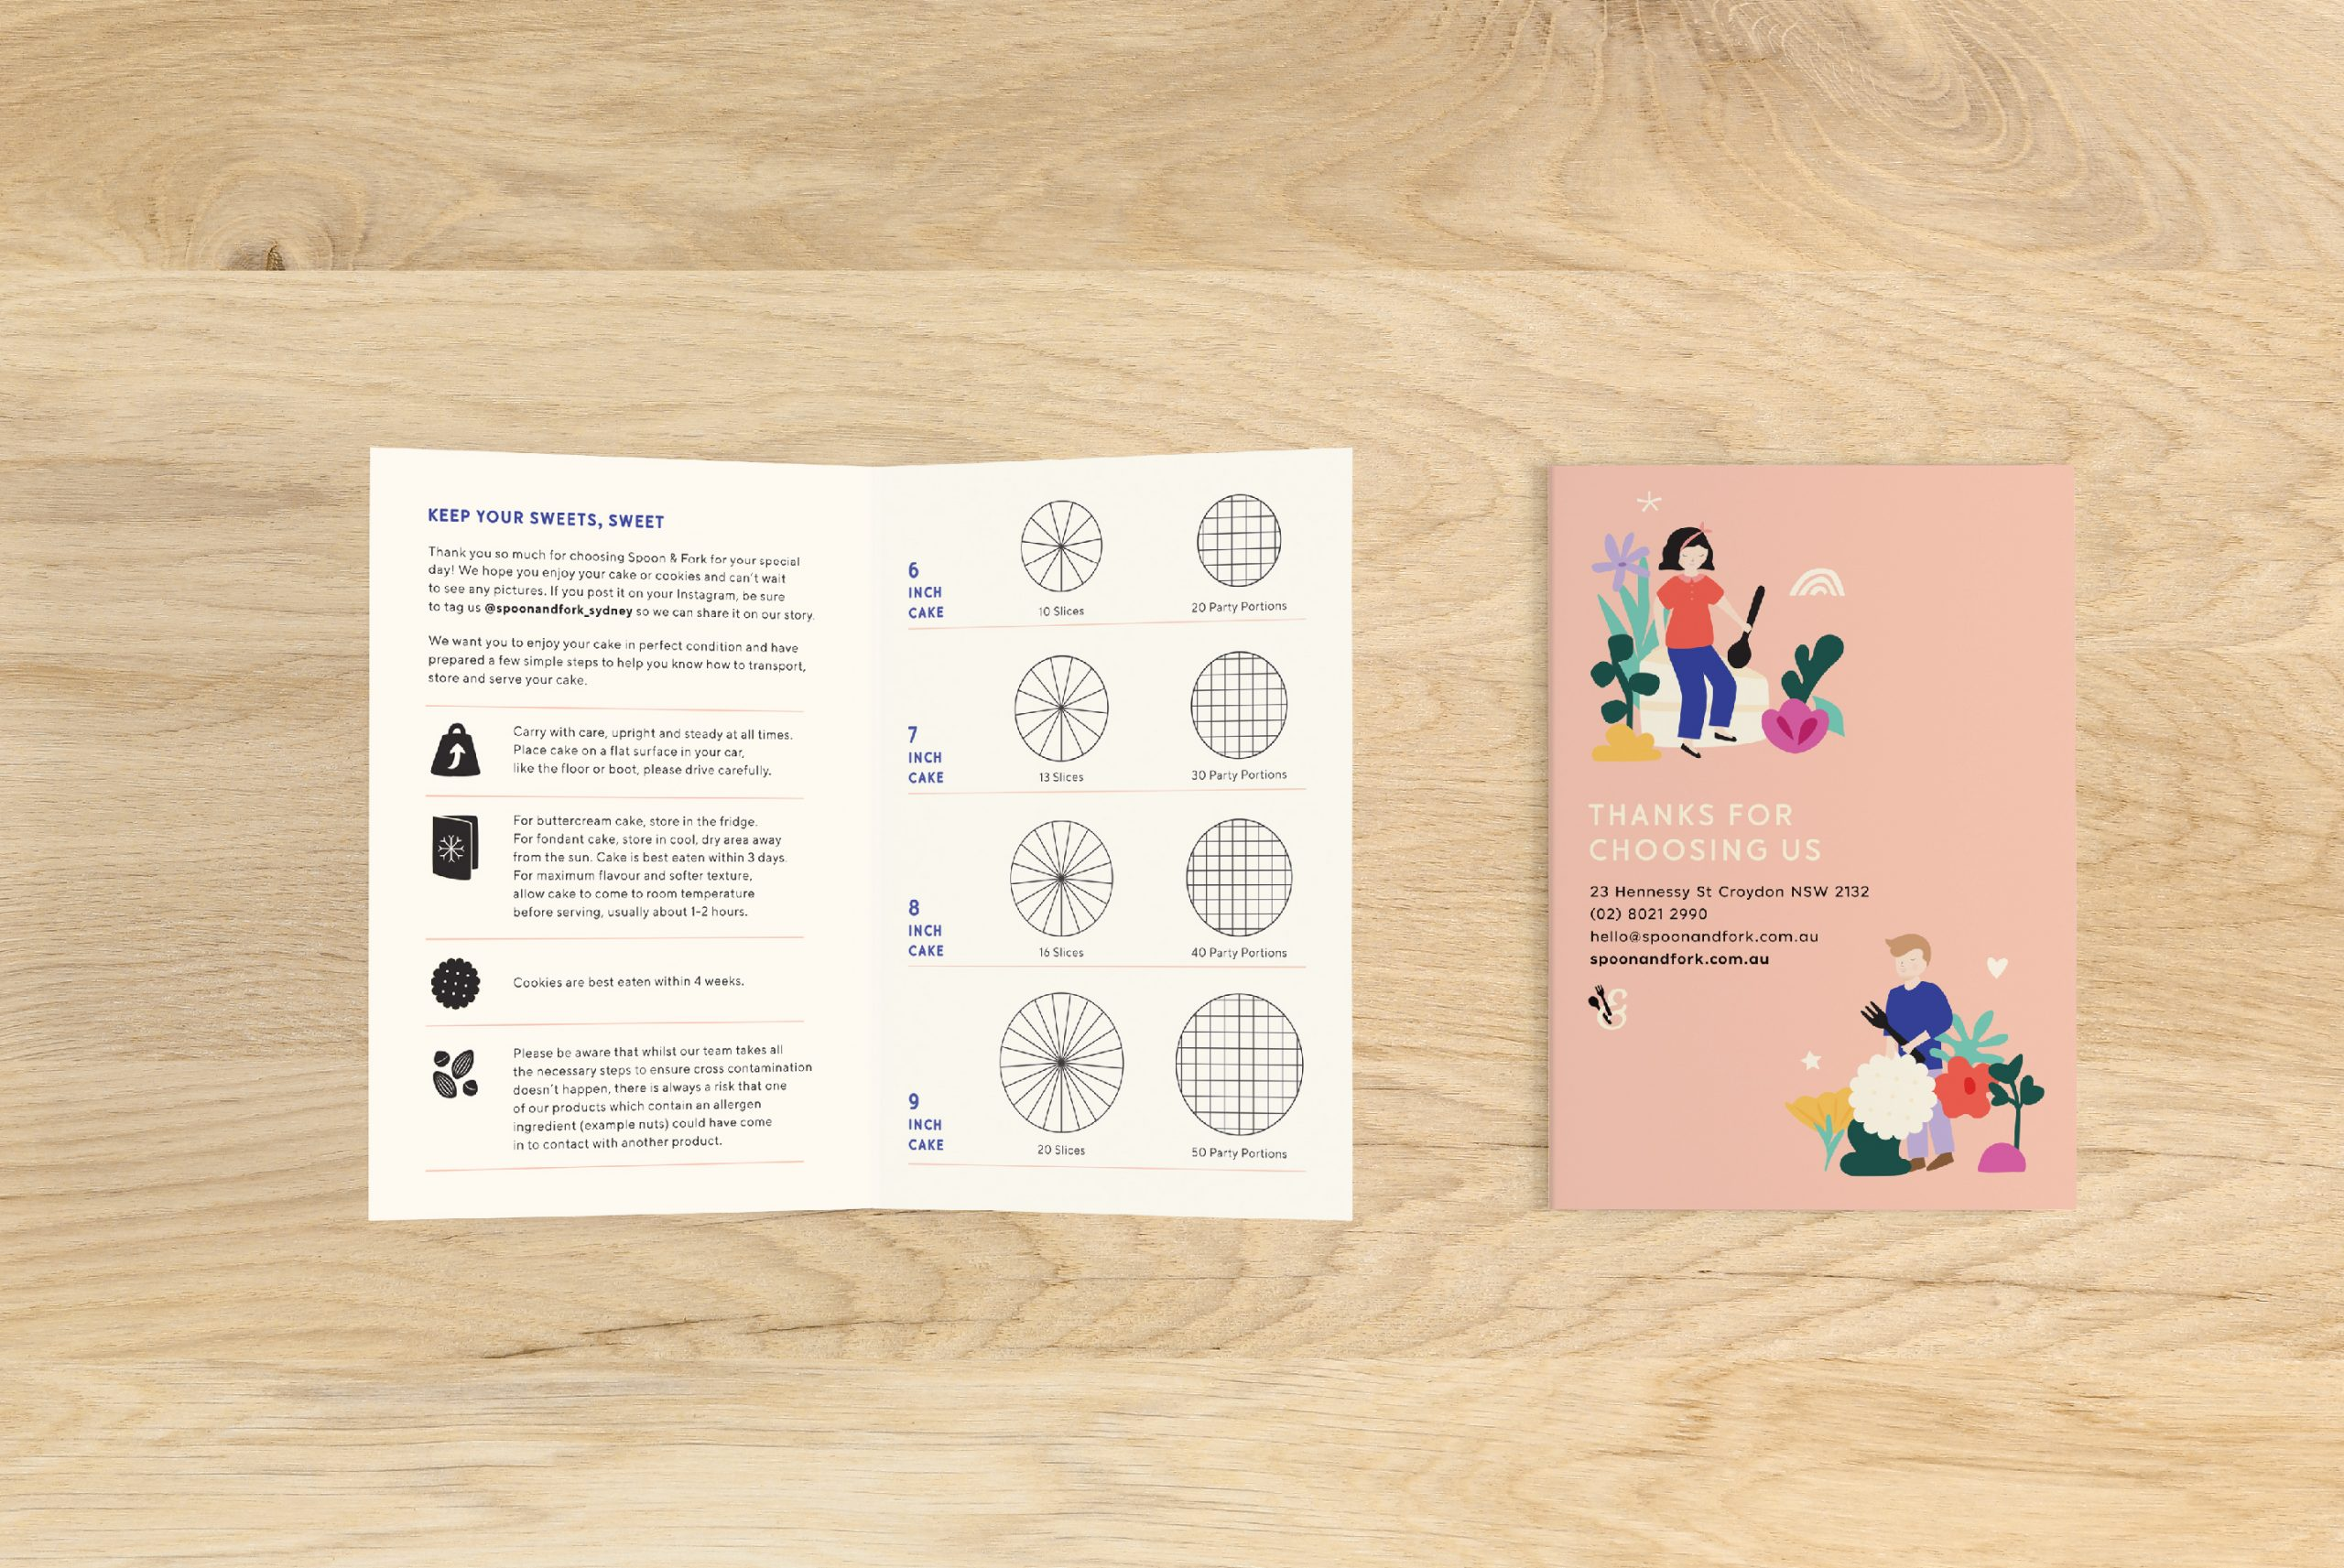 spoon-and-fork-brand-design-illustration-17